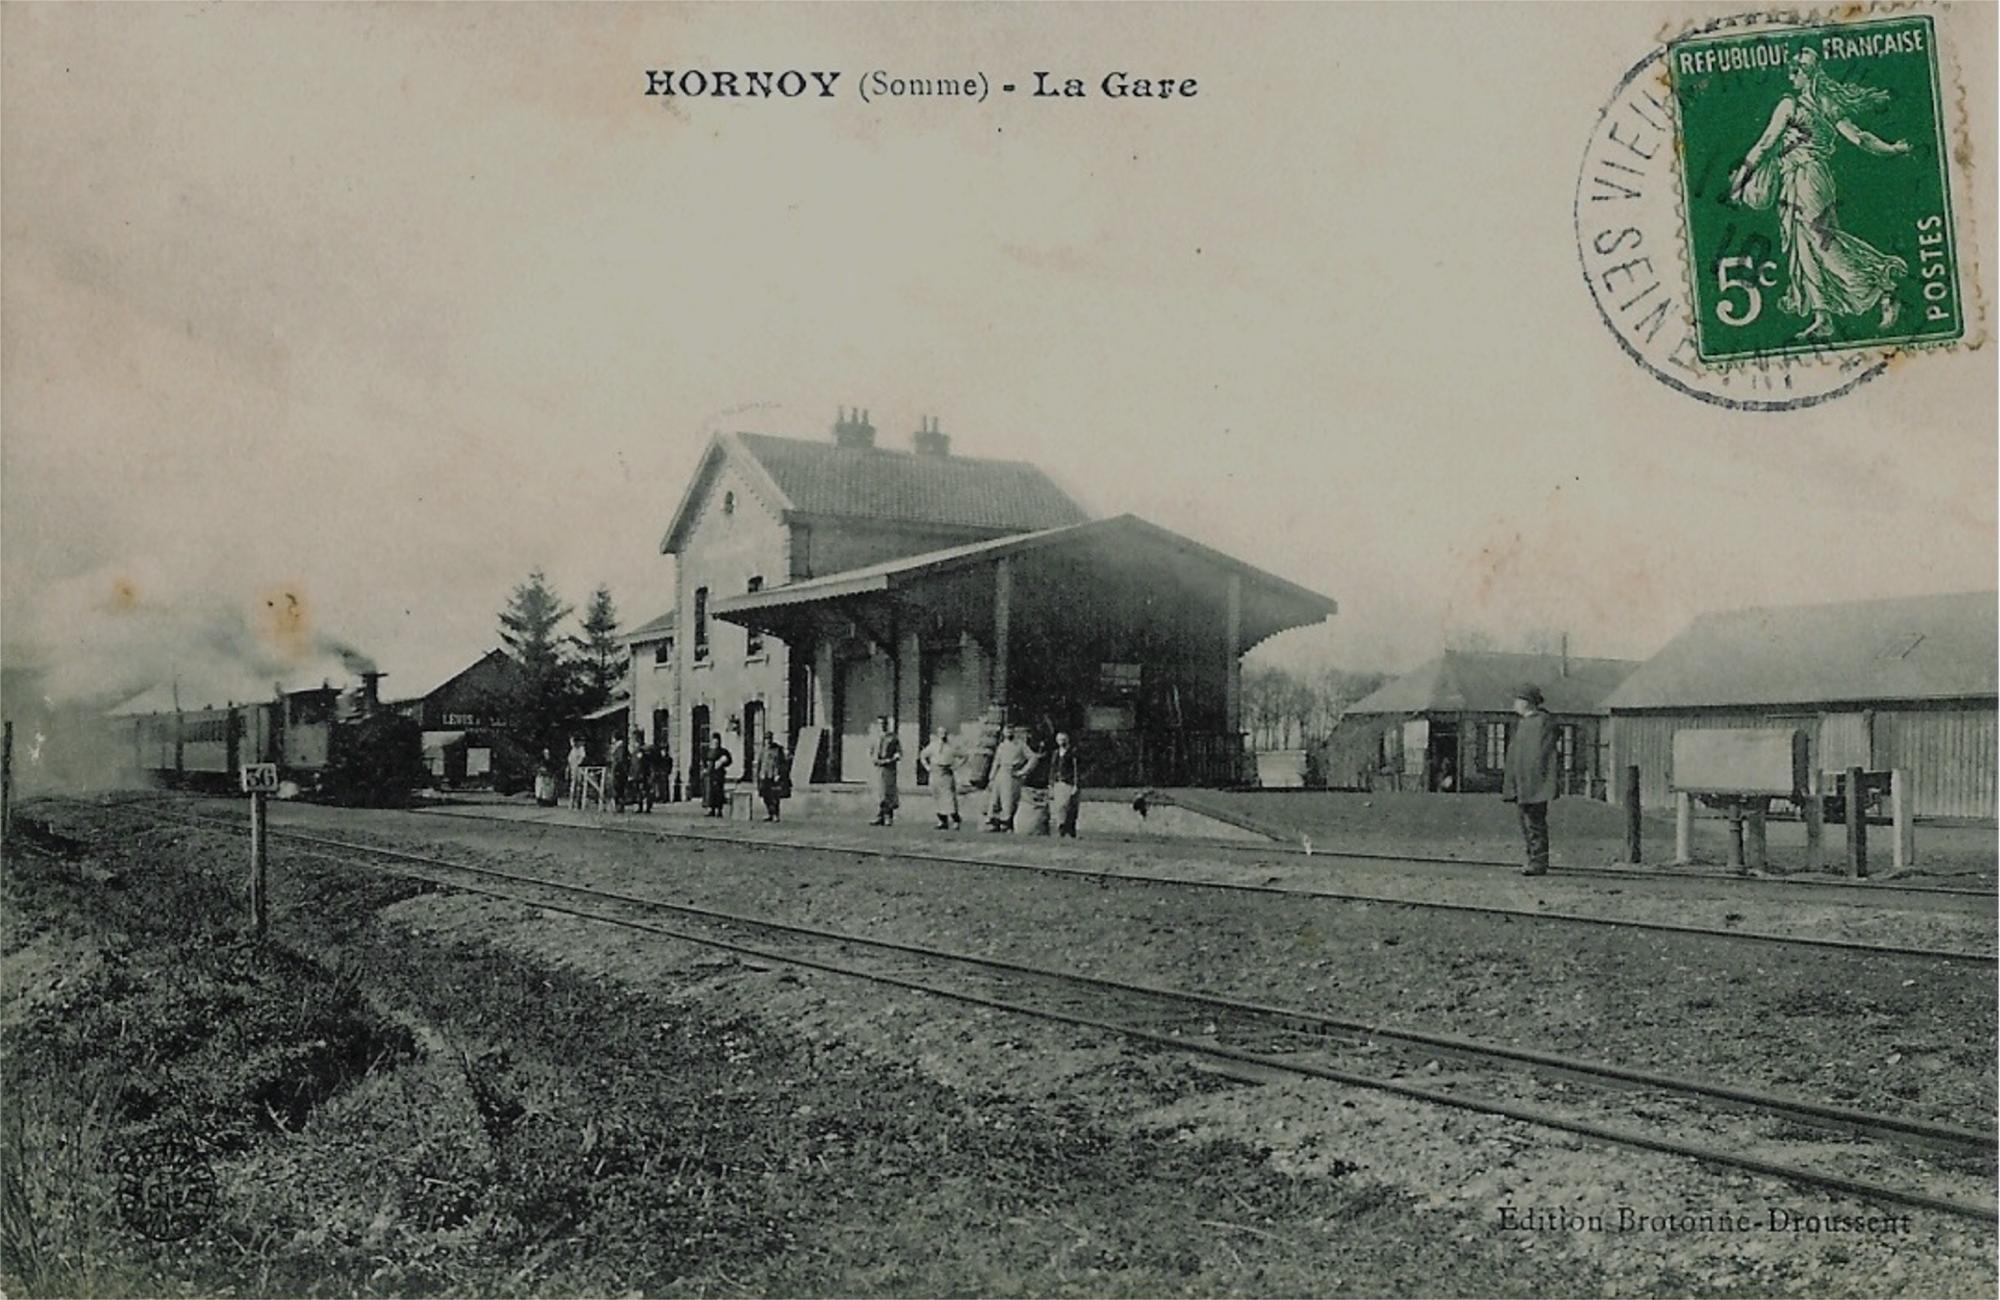 la gare2.jpg